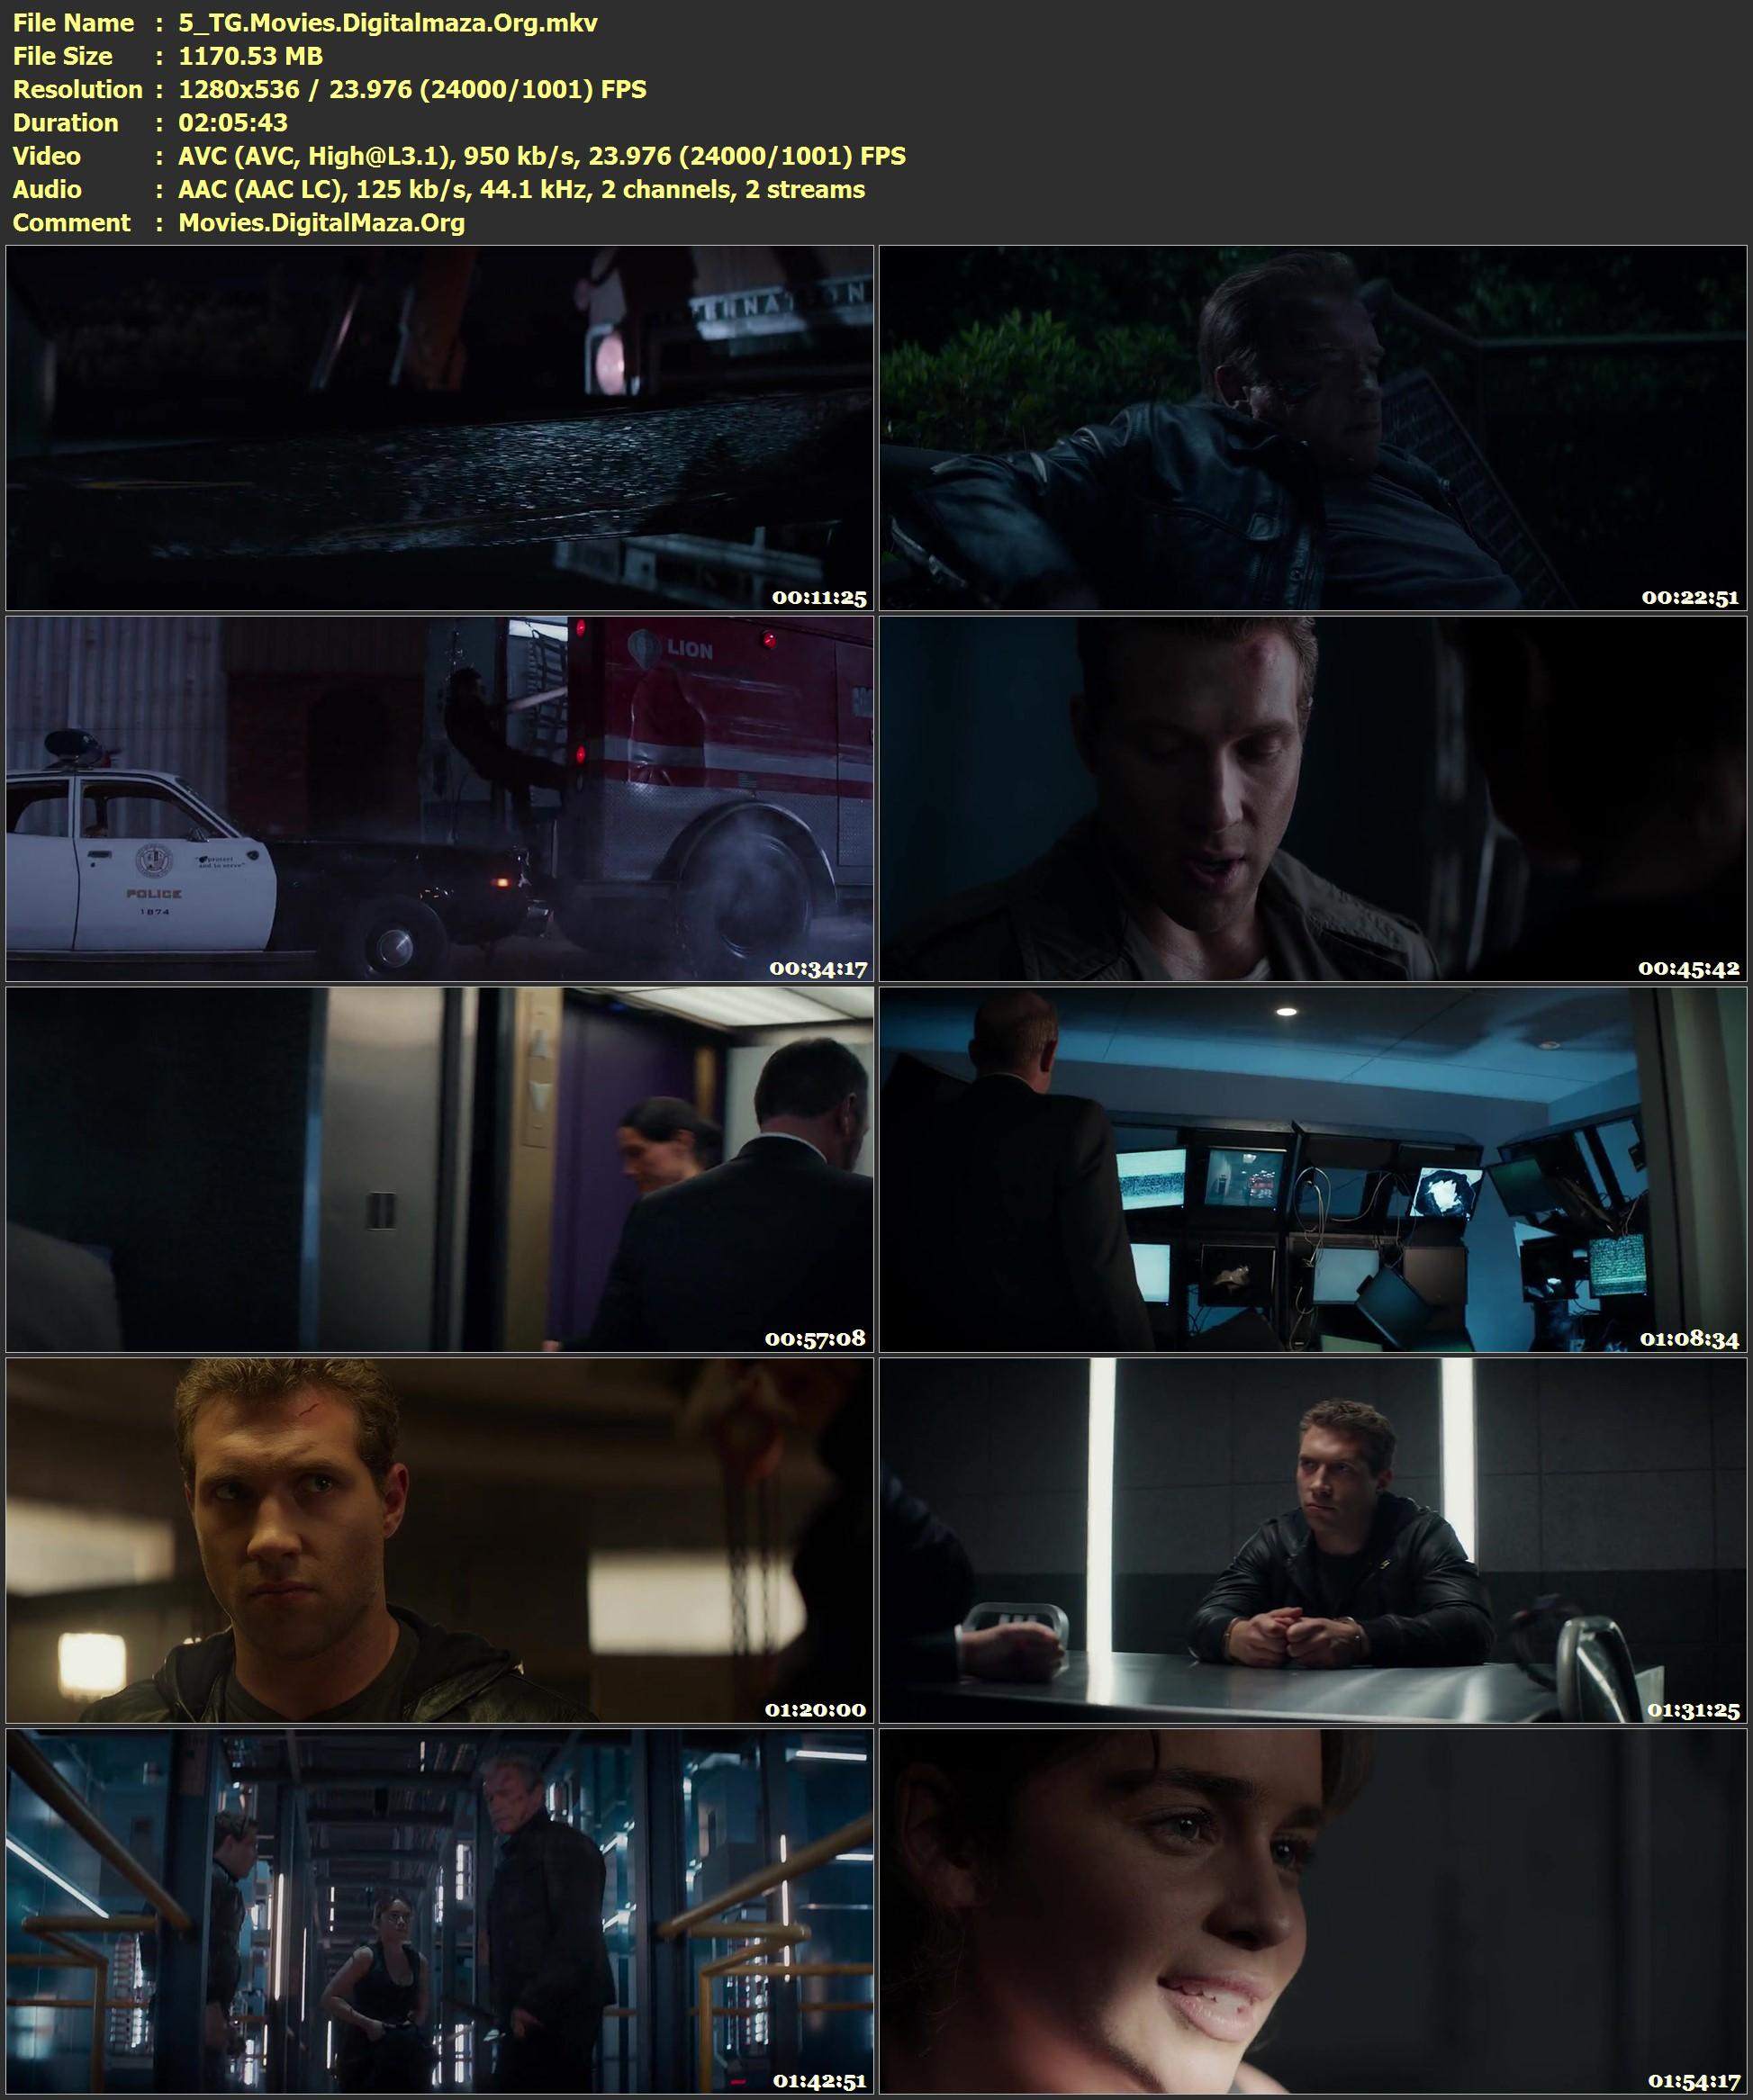 https://image.ibb.co/cZEZLx/5_TG_Movies_Digitalmaza_Org_mkv.jpg